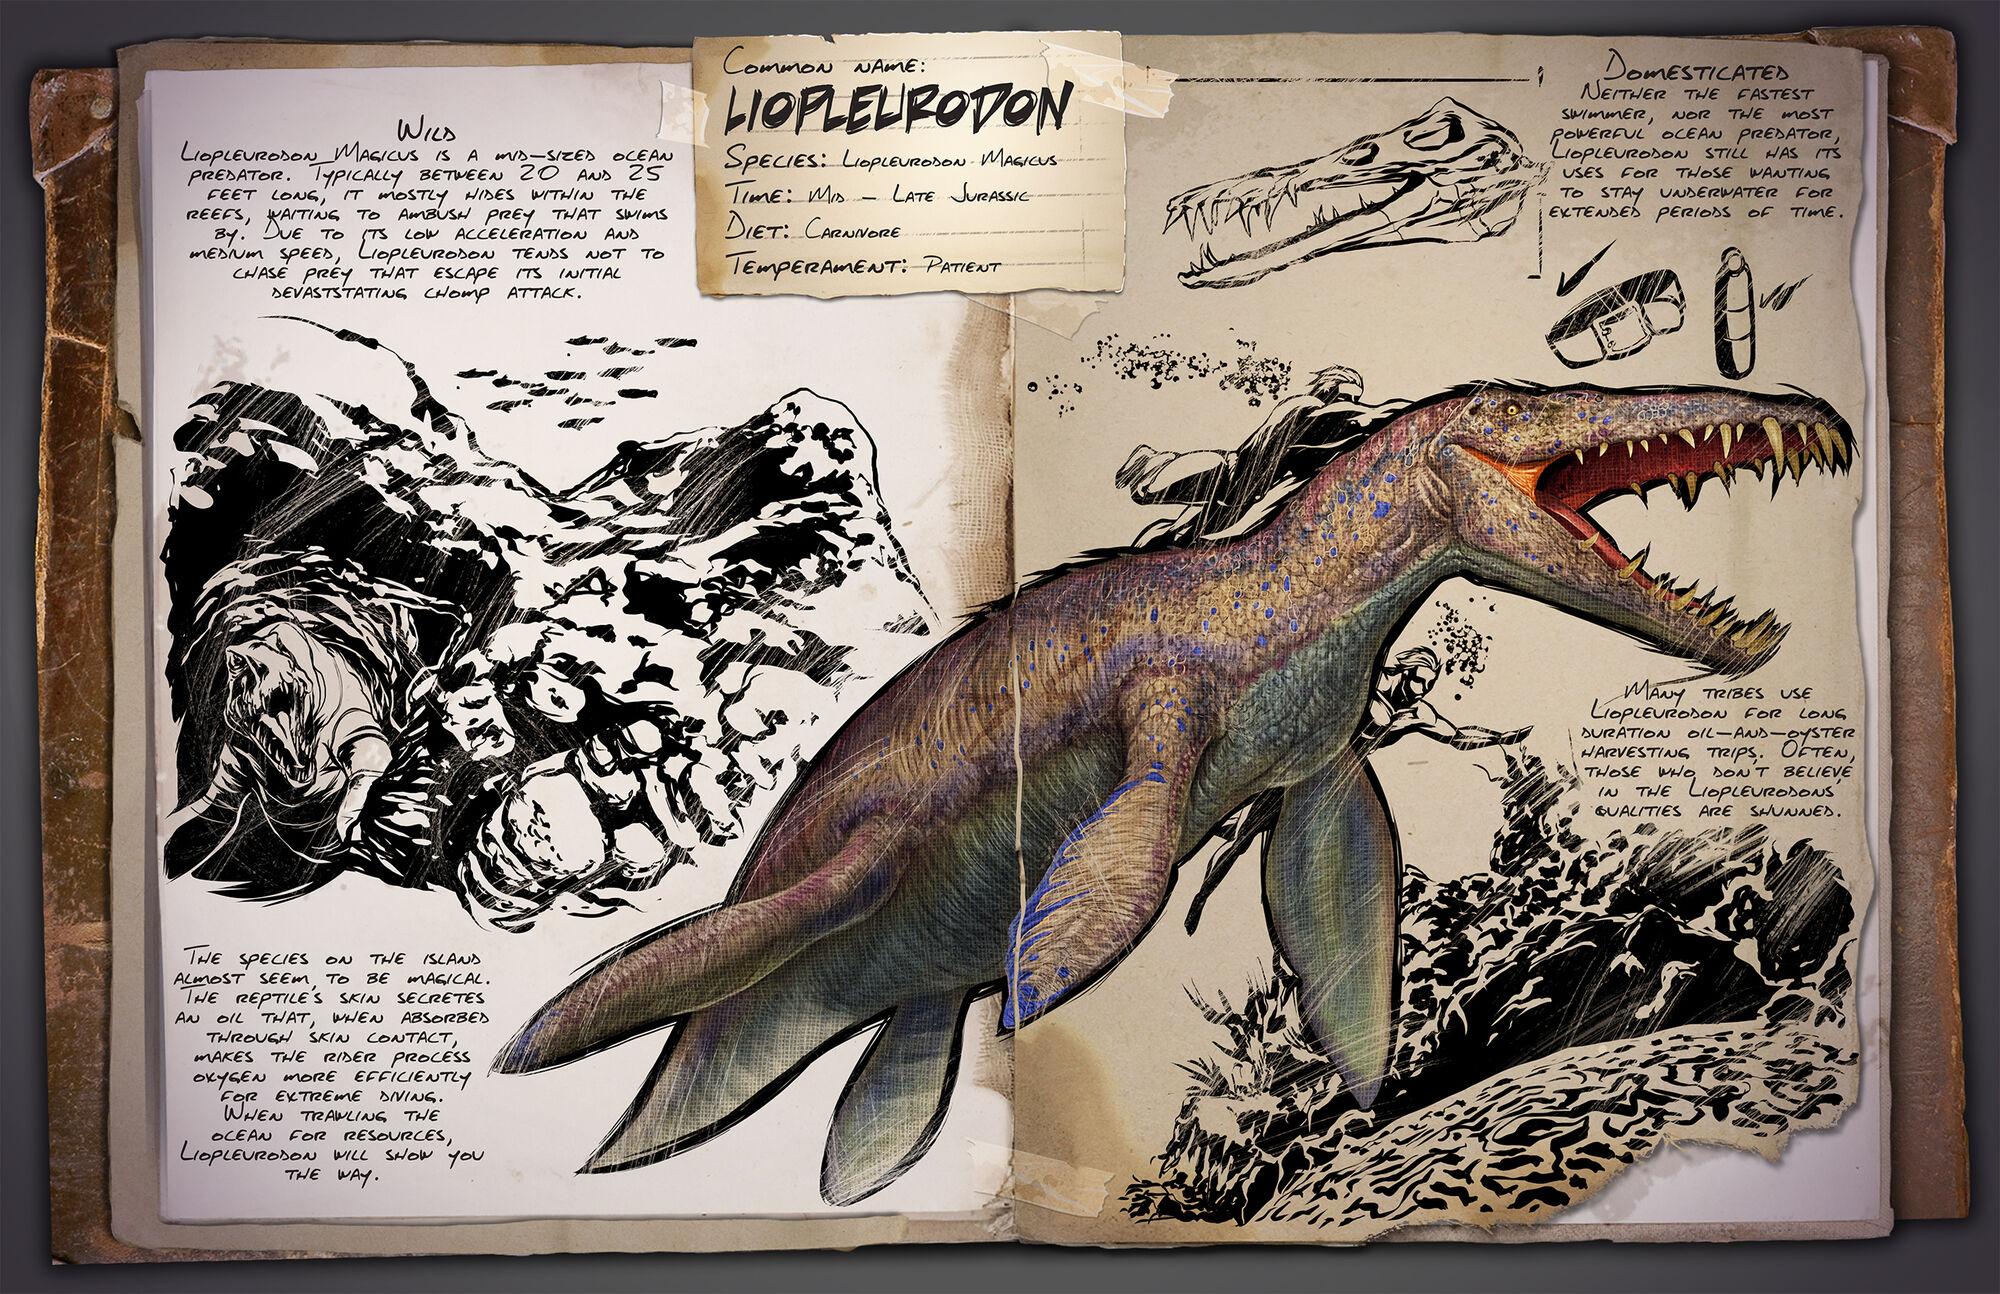 Liopleurodon | ARK: Survival Evolved Wiki | FANDOM powered